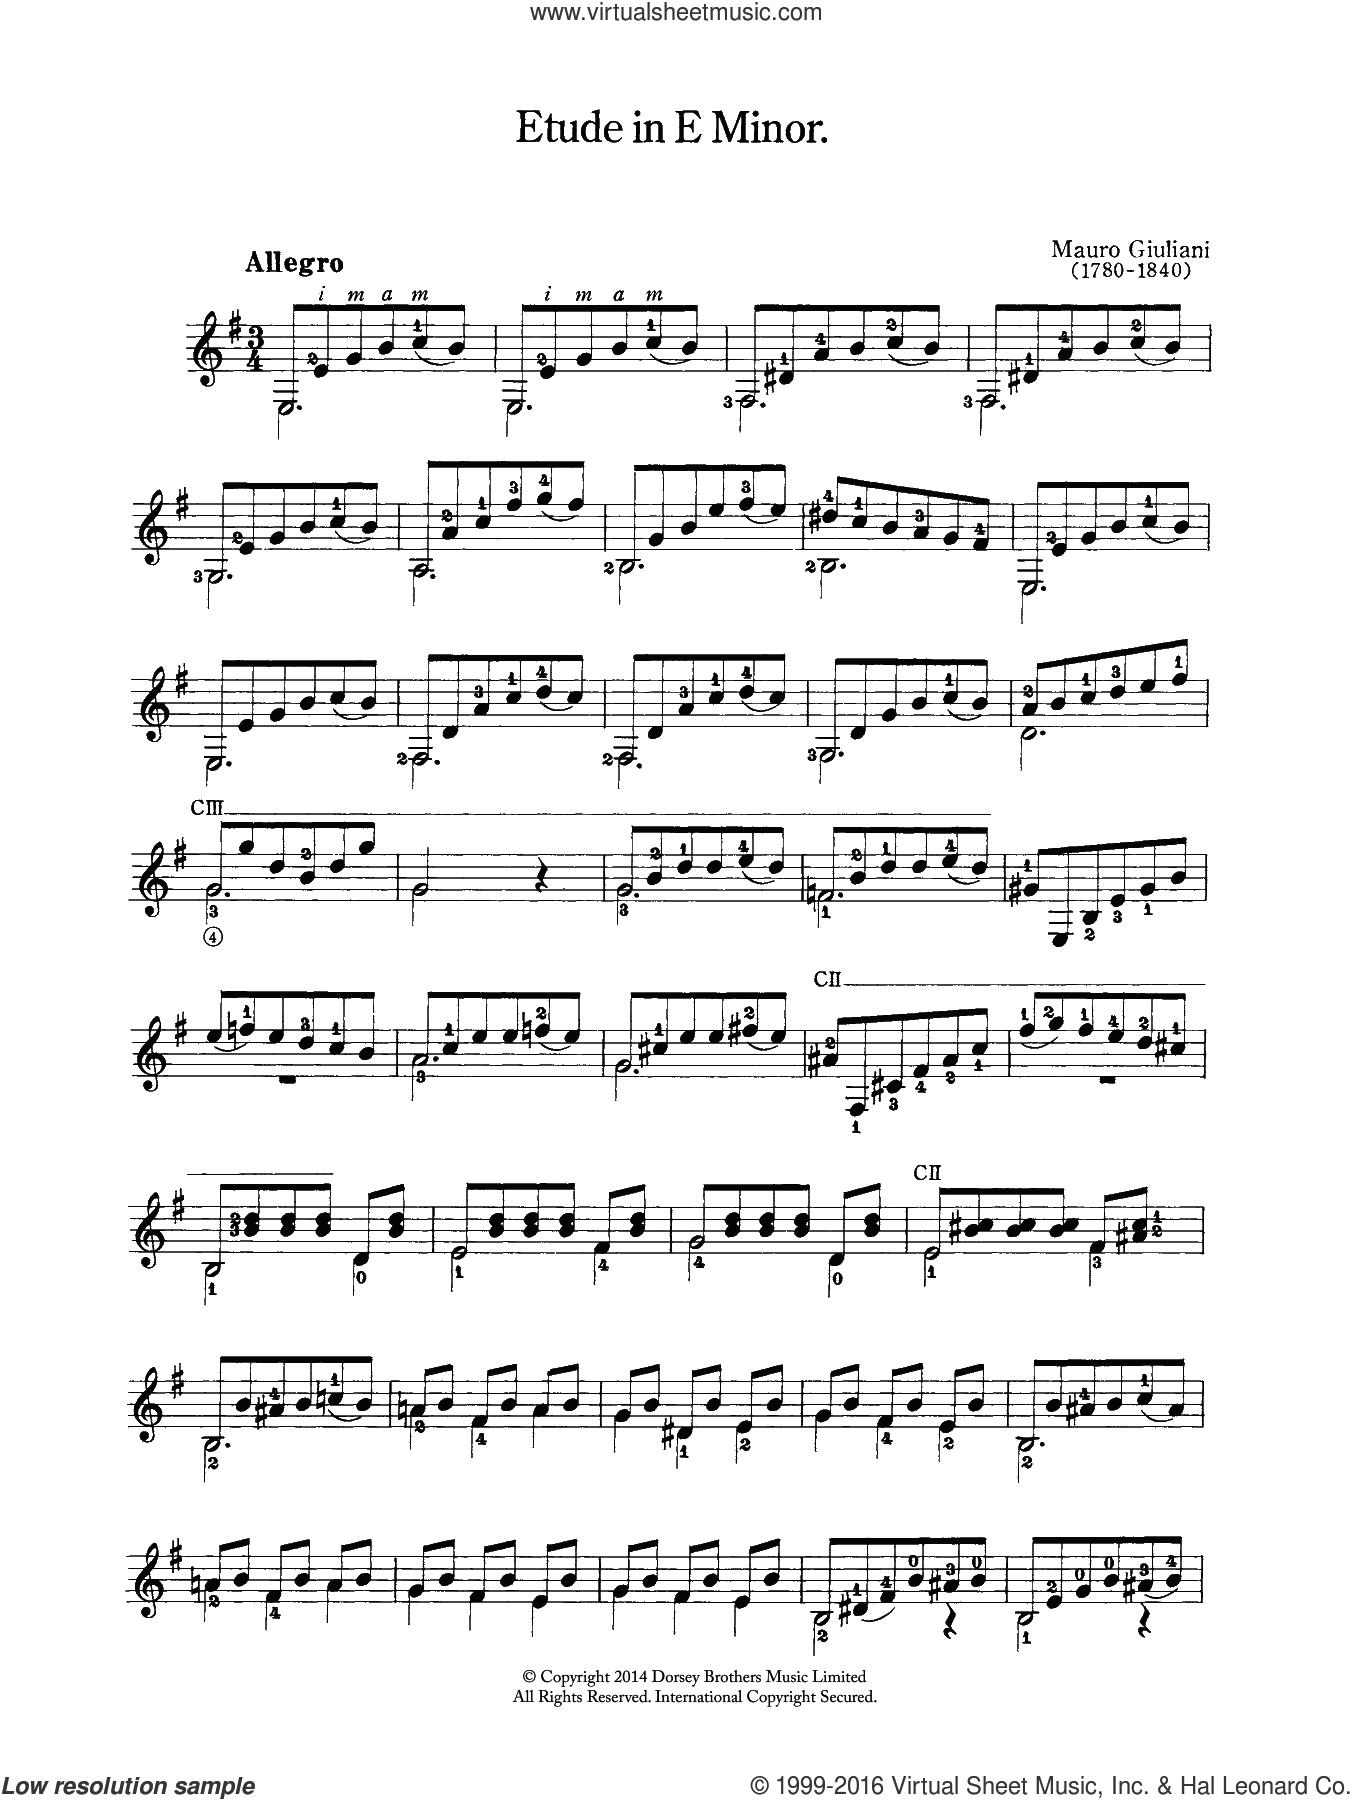 Etude In E Minor sheet music for guitar solo (chords) by Mauro Giuliani, classical score, easy guitar (chords)